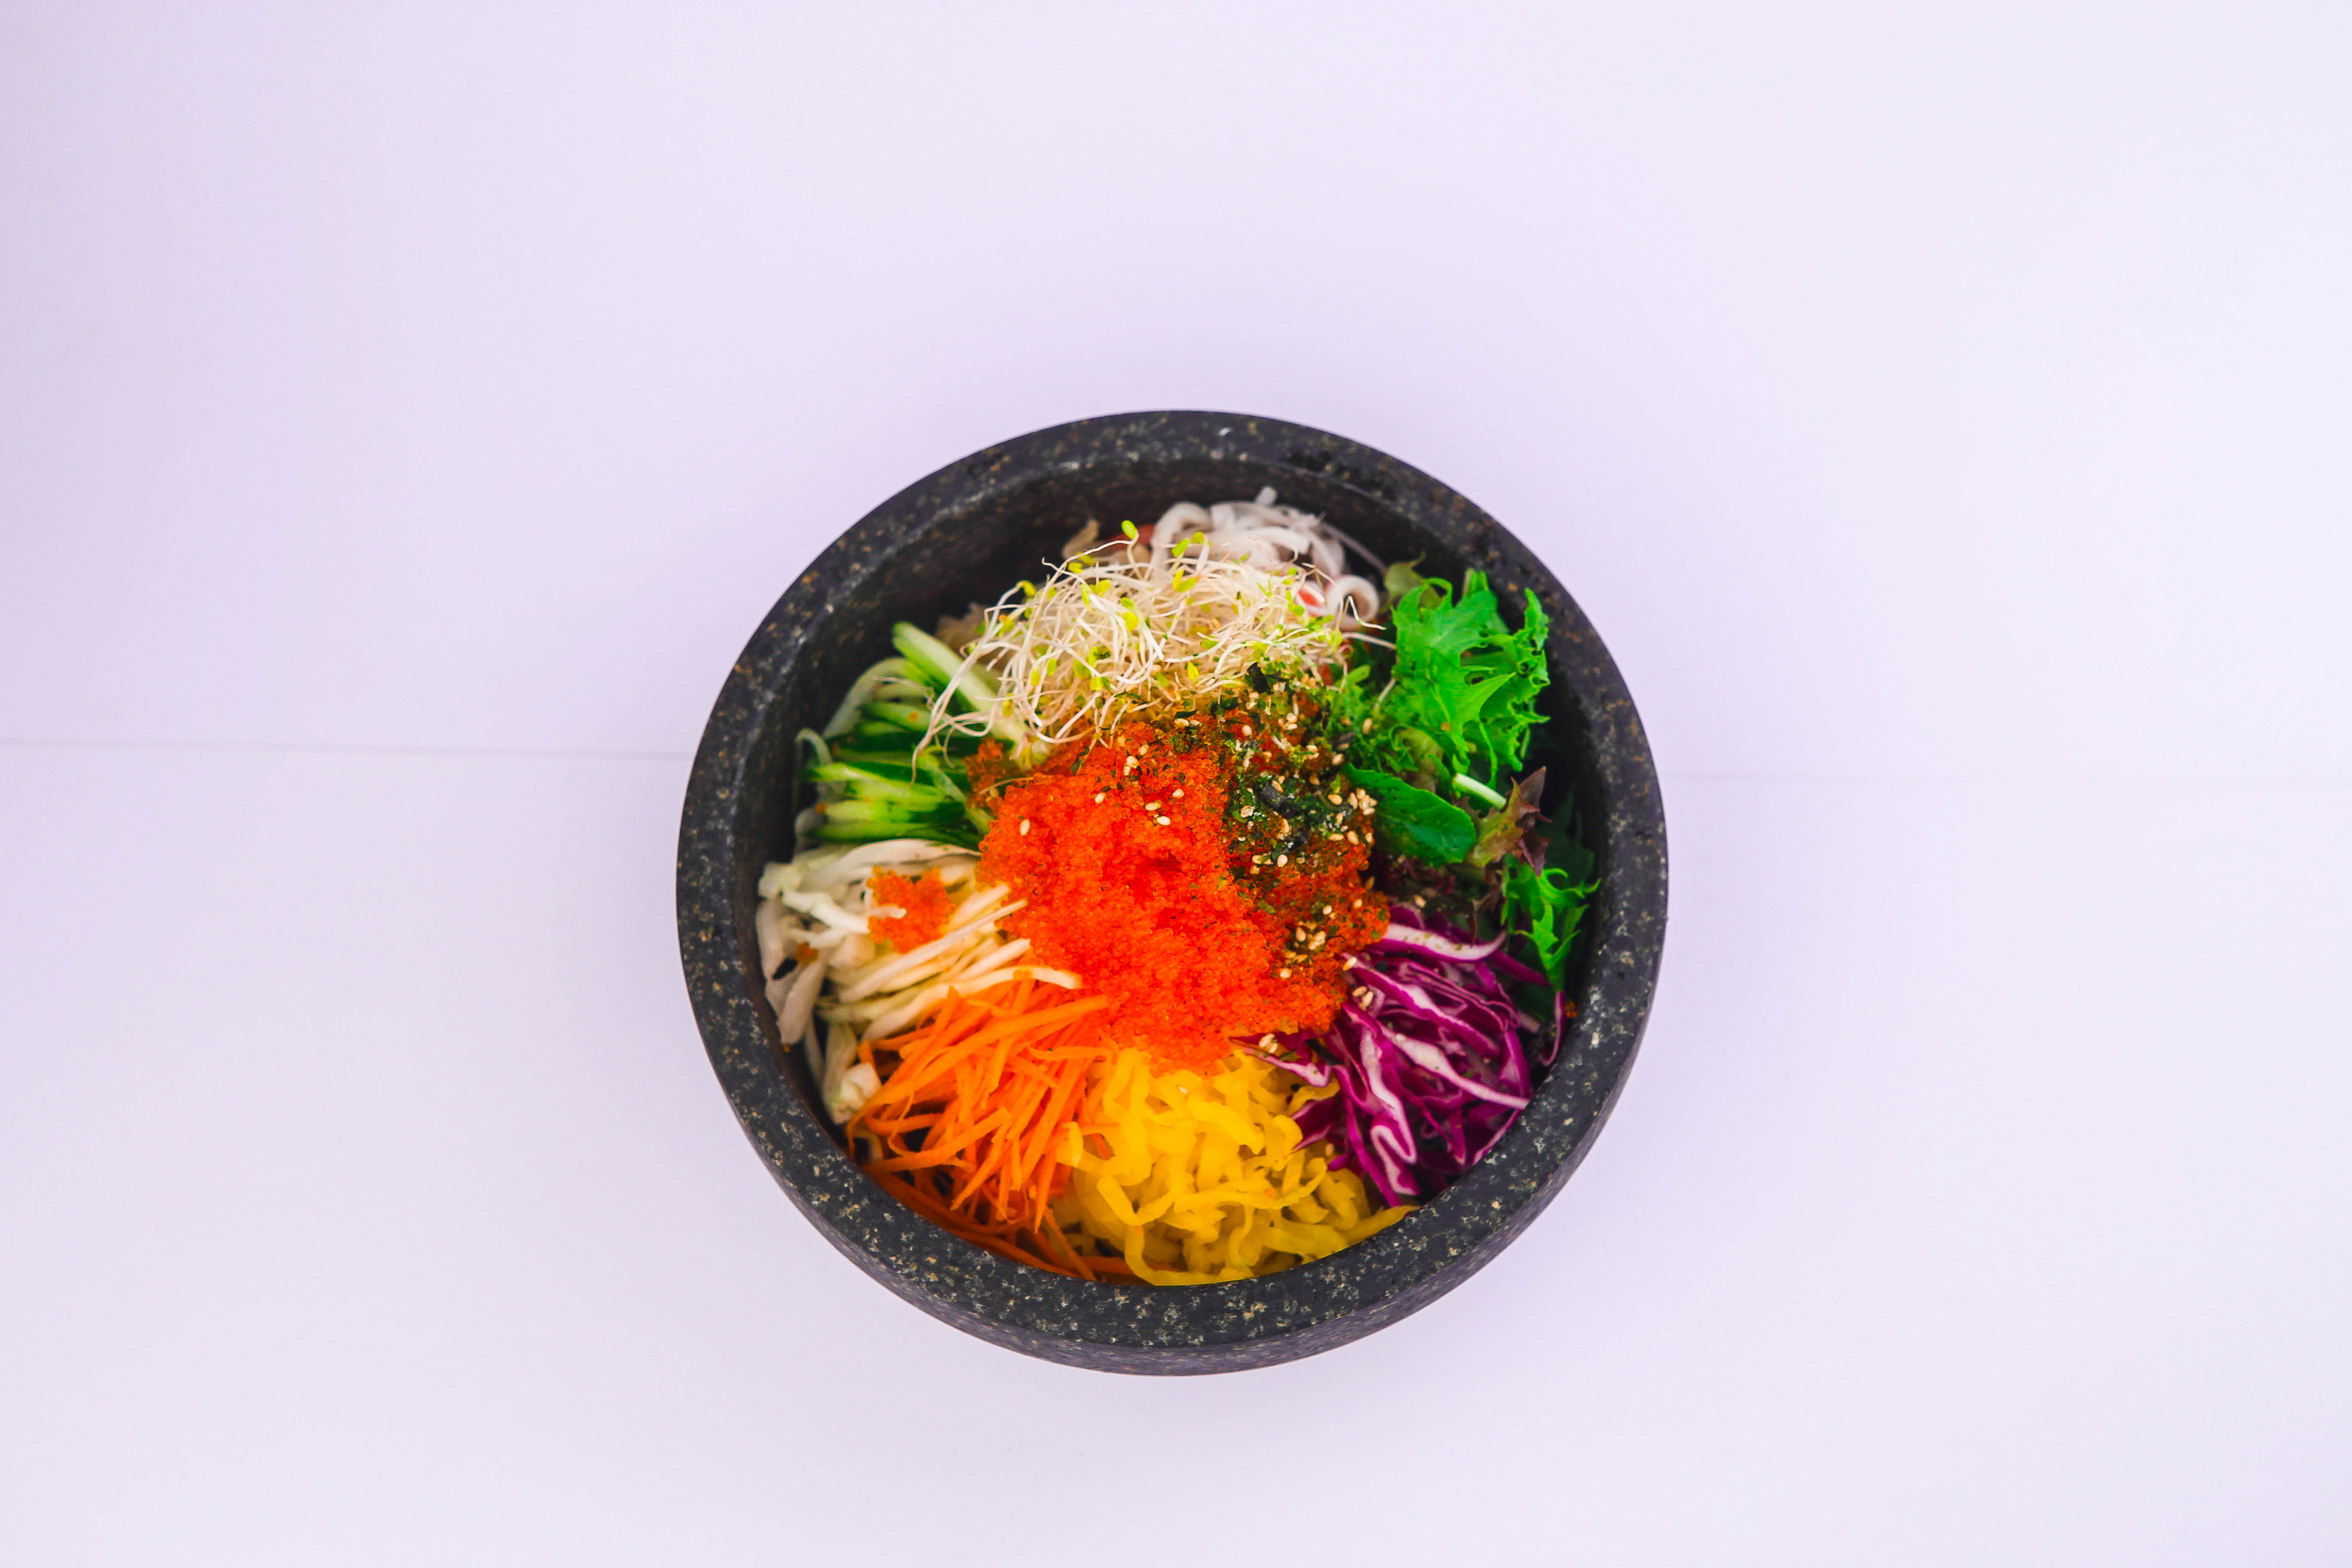 liquor-licensed-korean-restaurant-chinatown-300k-profit-to-owner-7